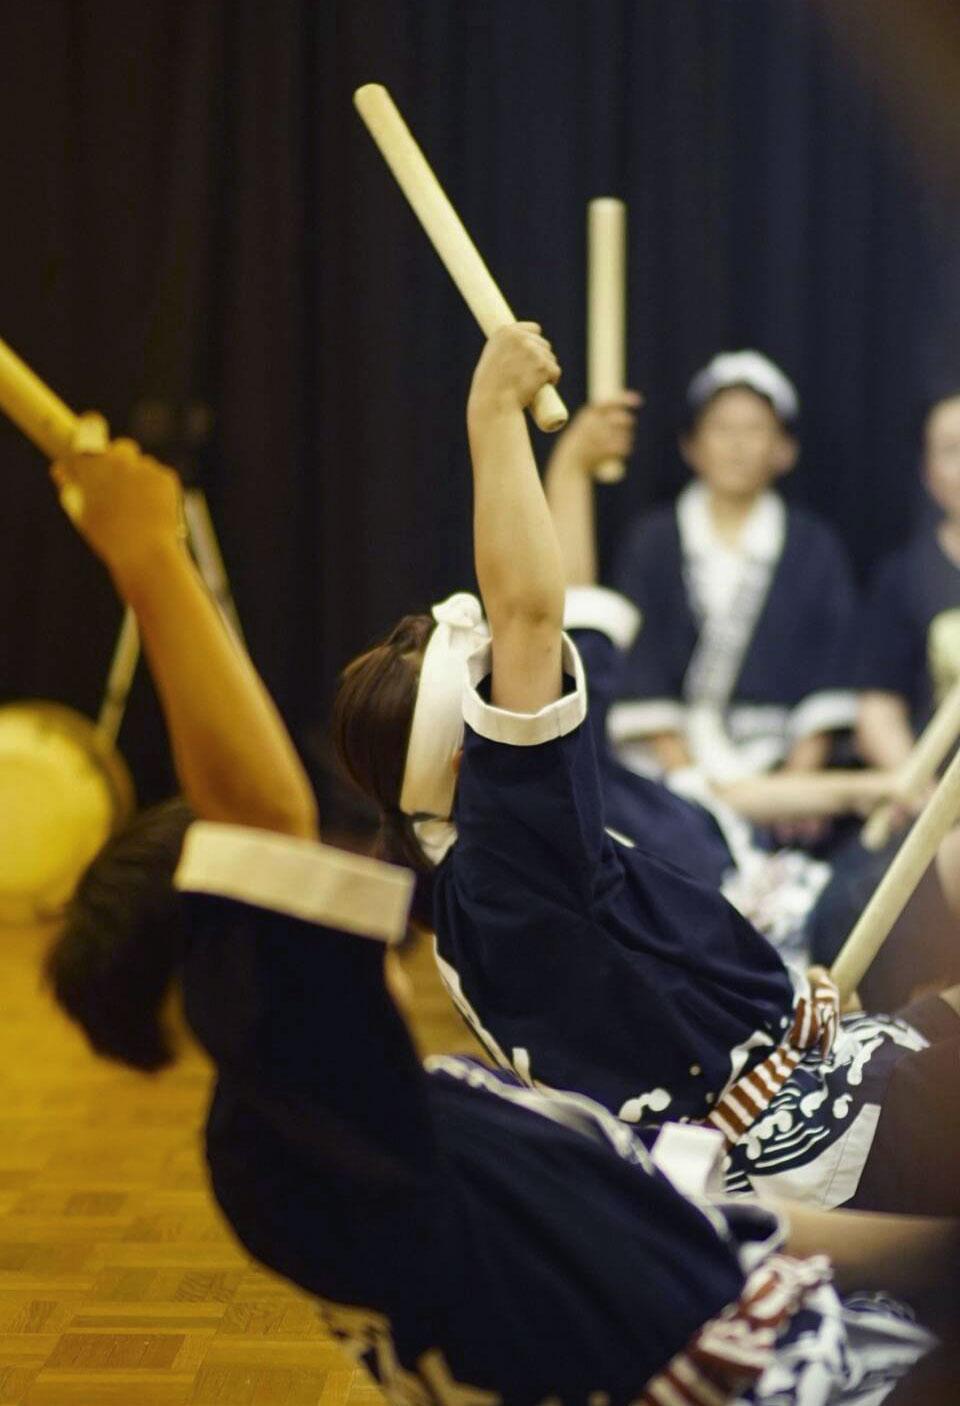 2018年 高島2丁目町内会盆踊り